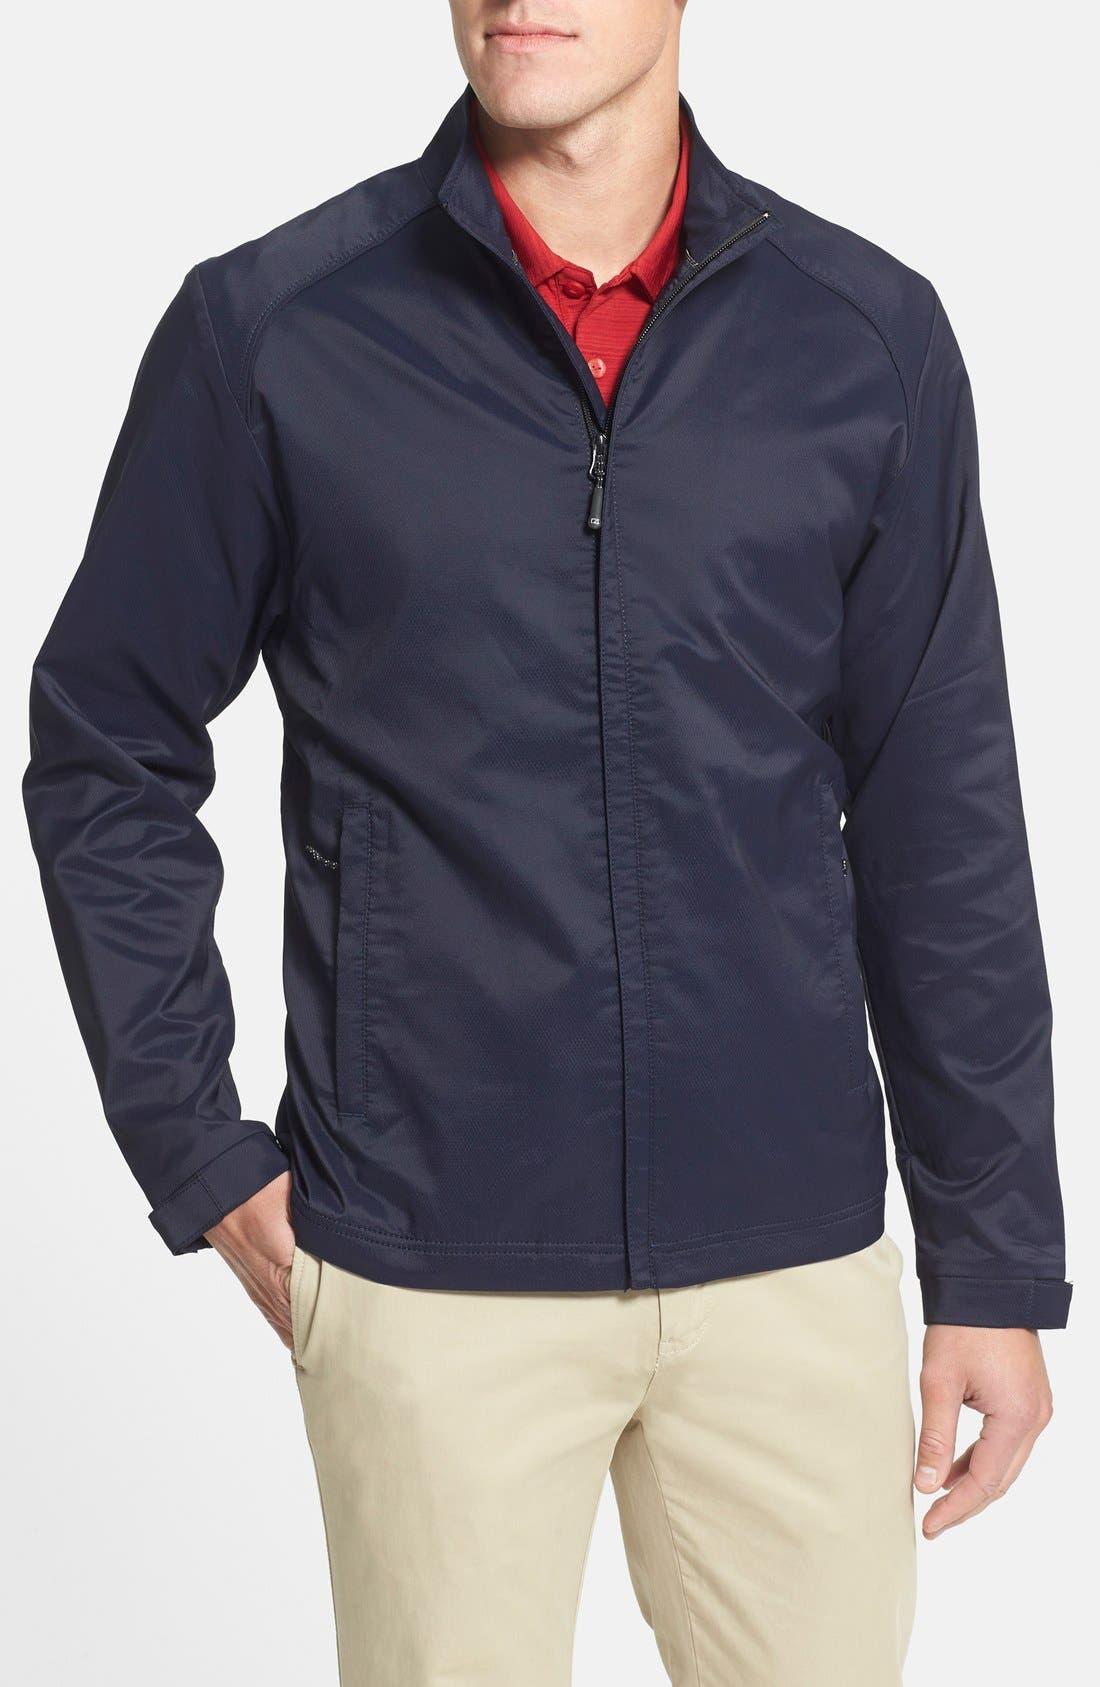 Cutter & Buck Blakely WeatherTec® Wind & Water Resistant Full Zip Jacket